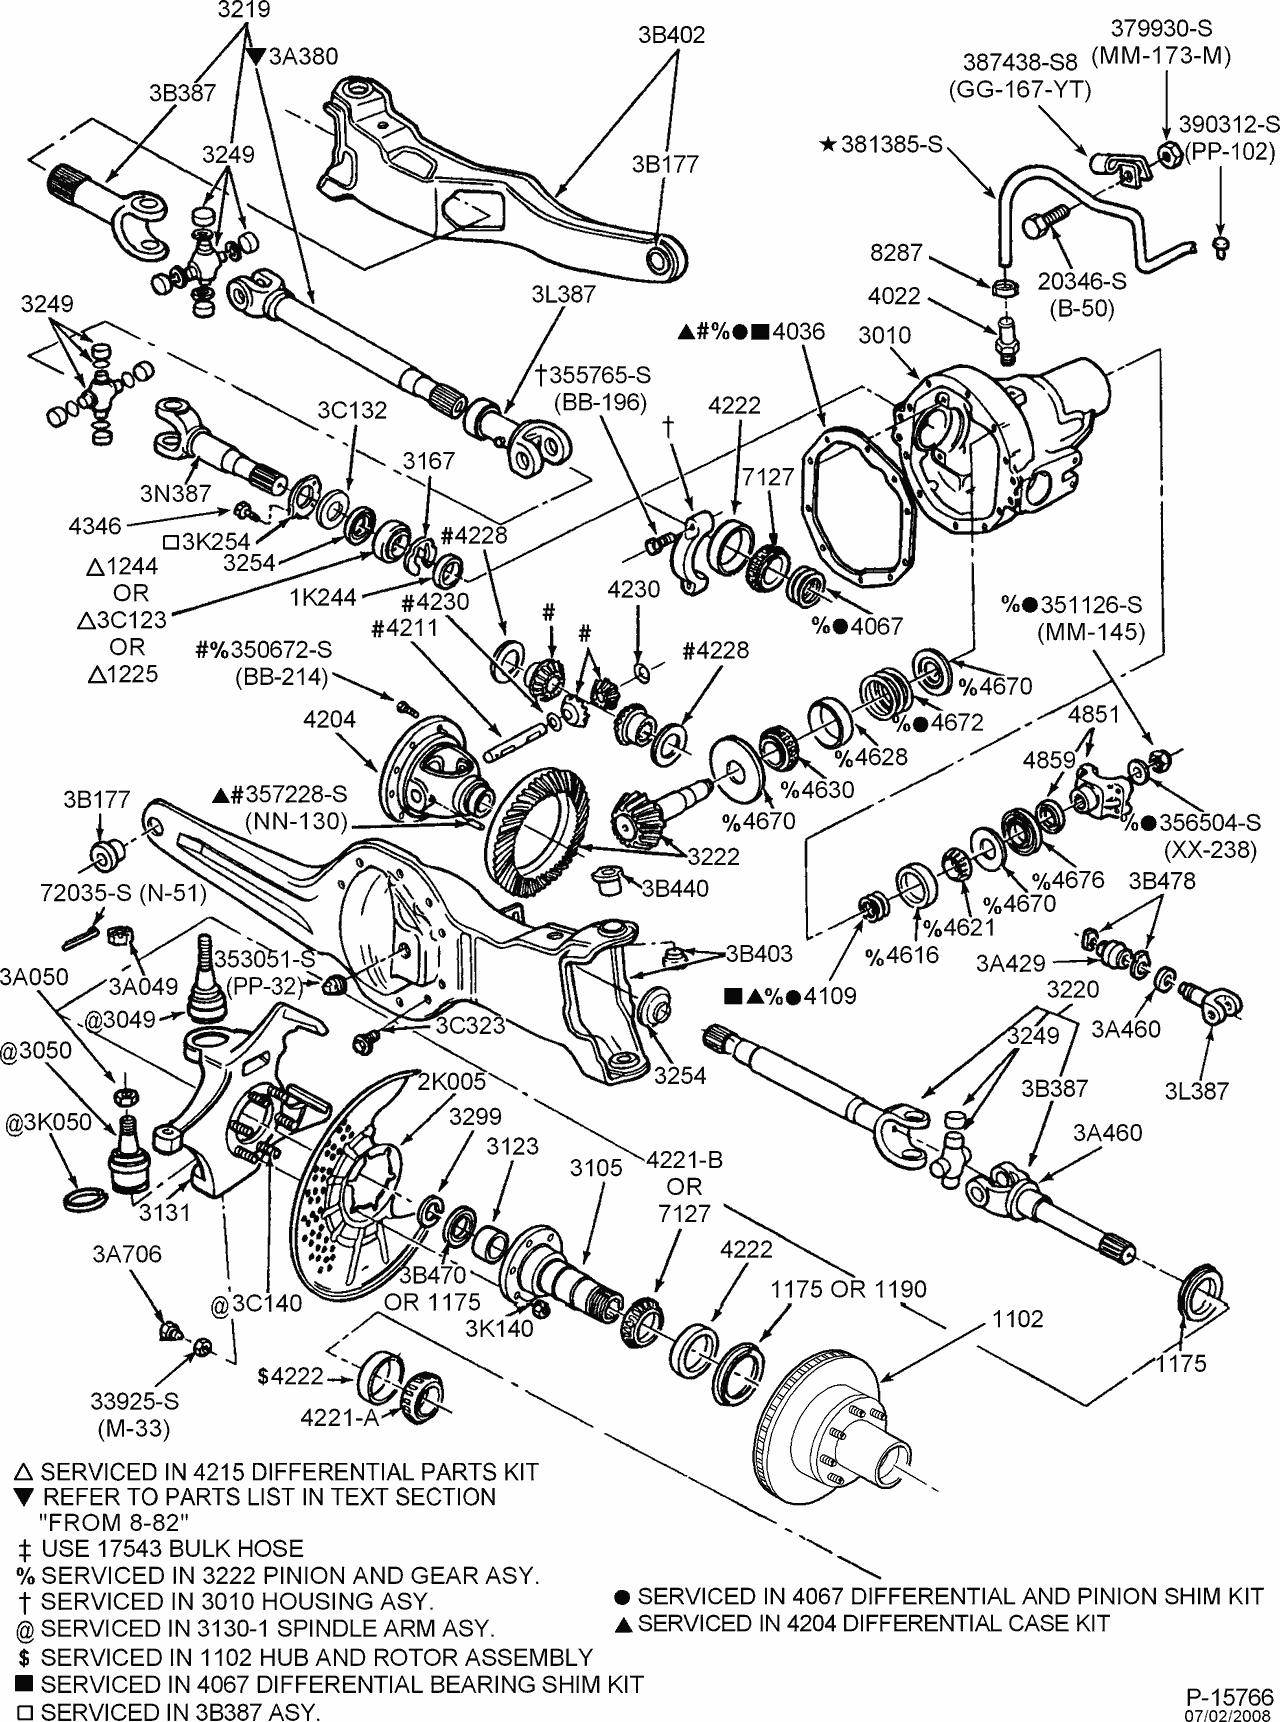 1996 ford f250 wiring schematics fr 1149  96 f250 7 3 wiring diagram schematic wiring  96 f250 7 3 wiring diagram schematic wiring